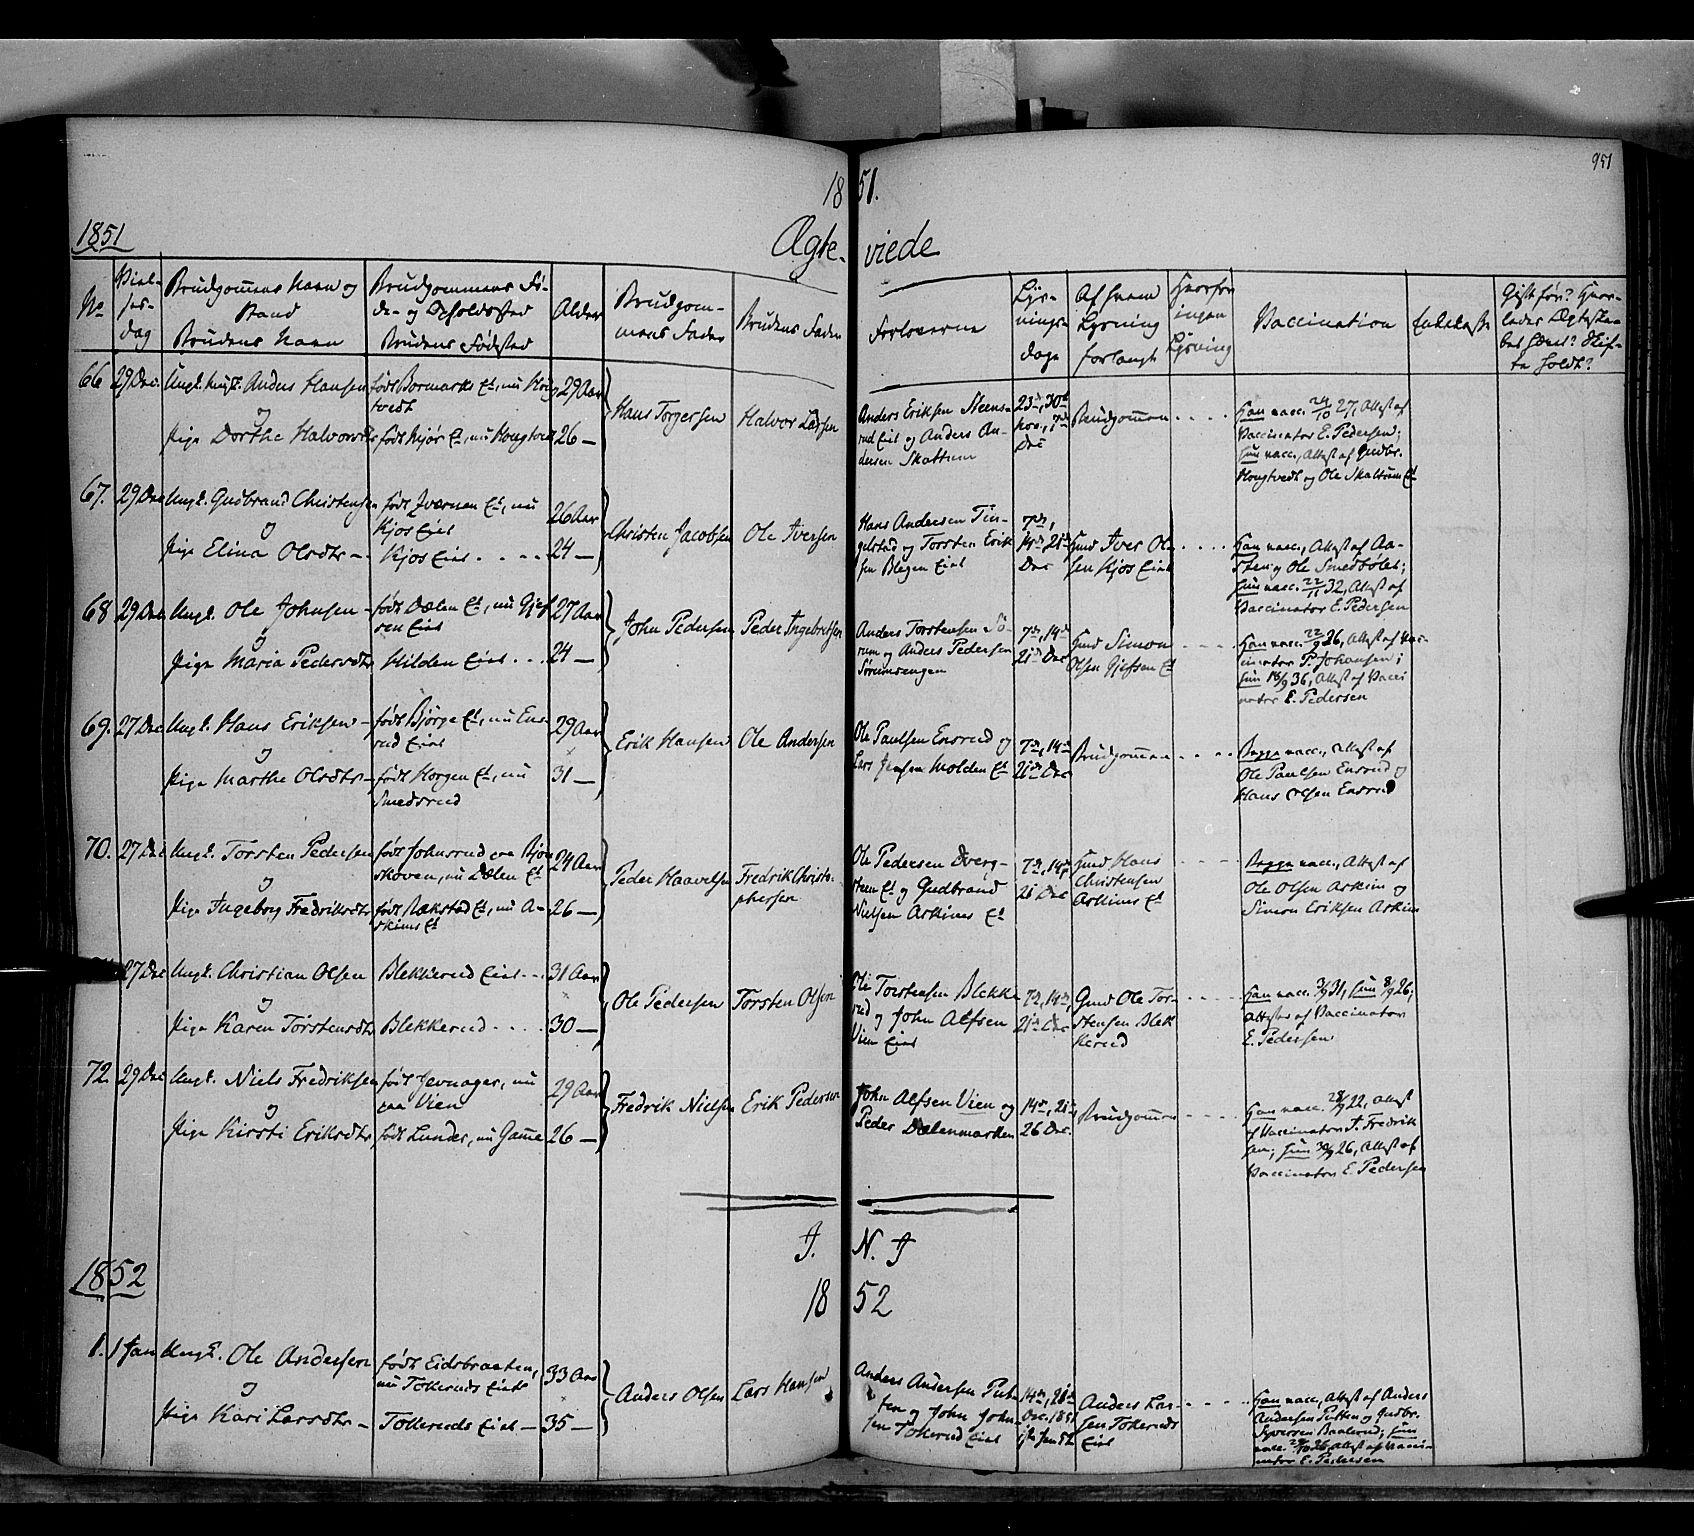 SAH, Gran prestekontor, Ministerialbok nr. 11, 1842-1856, s. 950-951